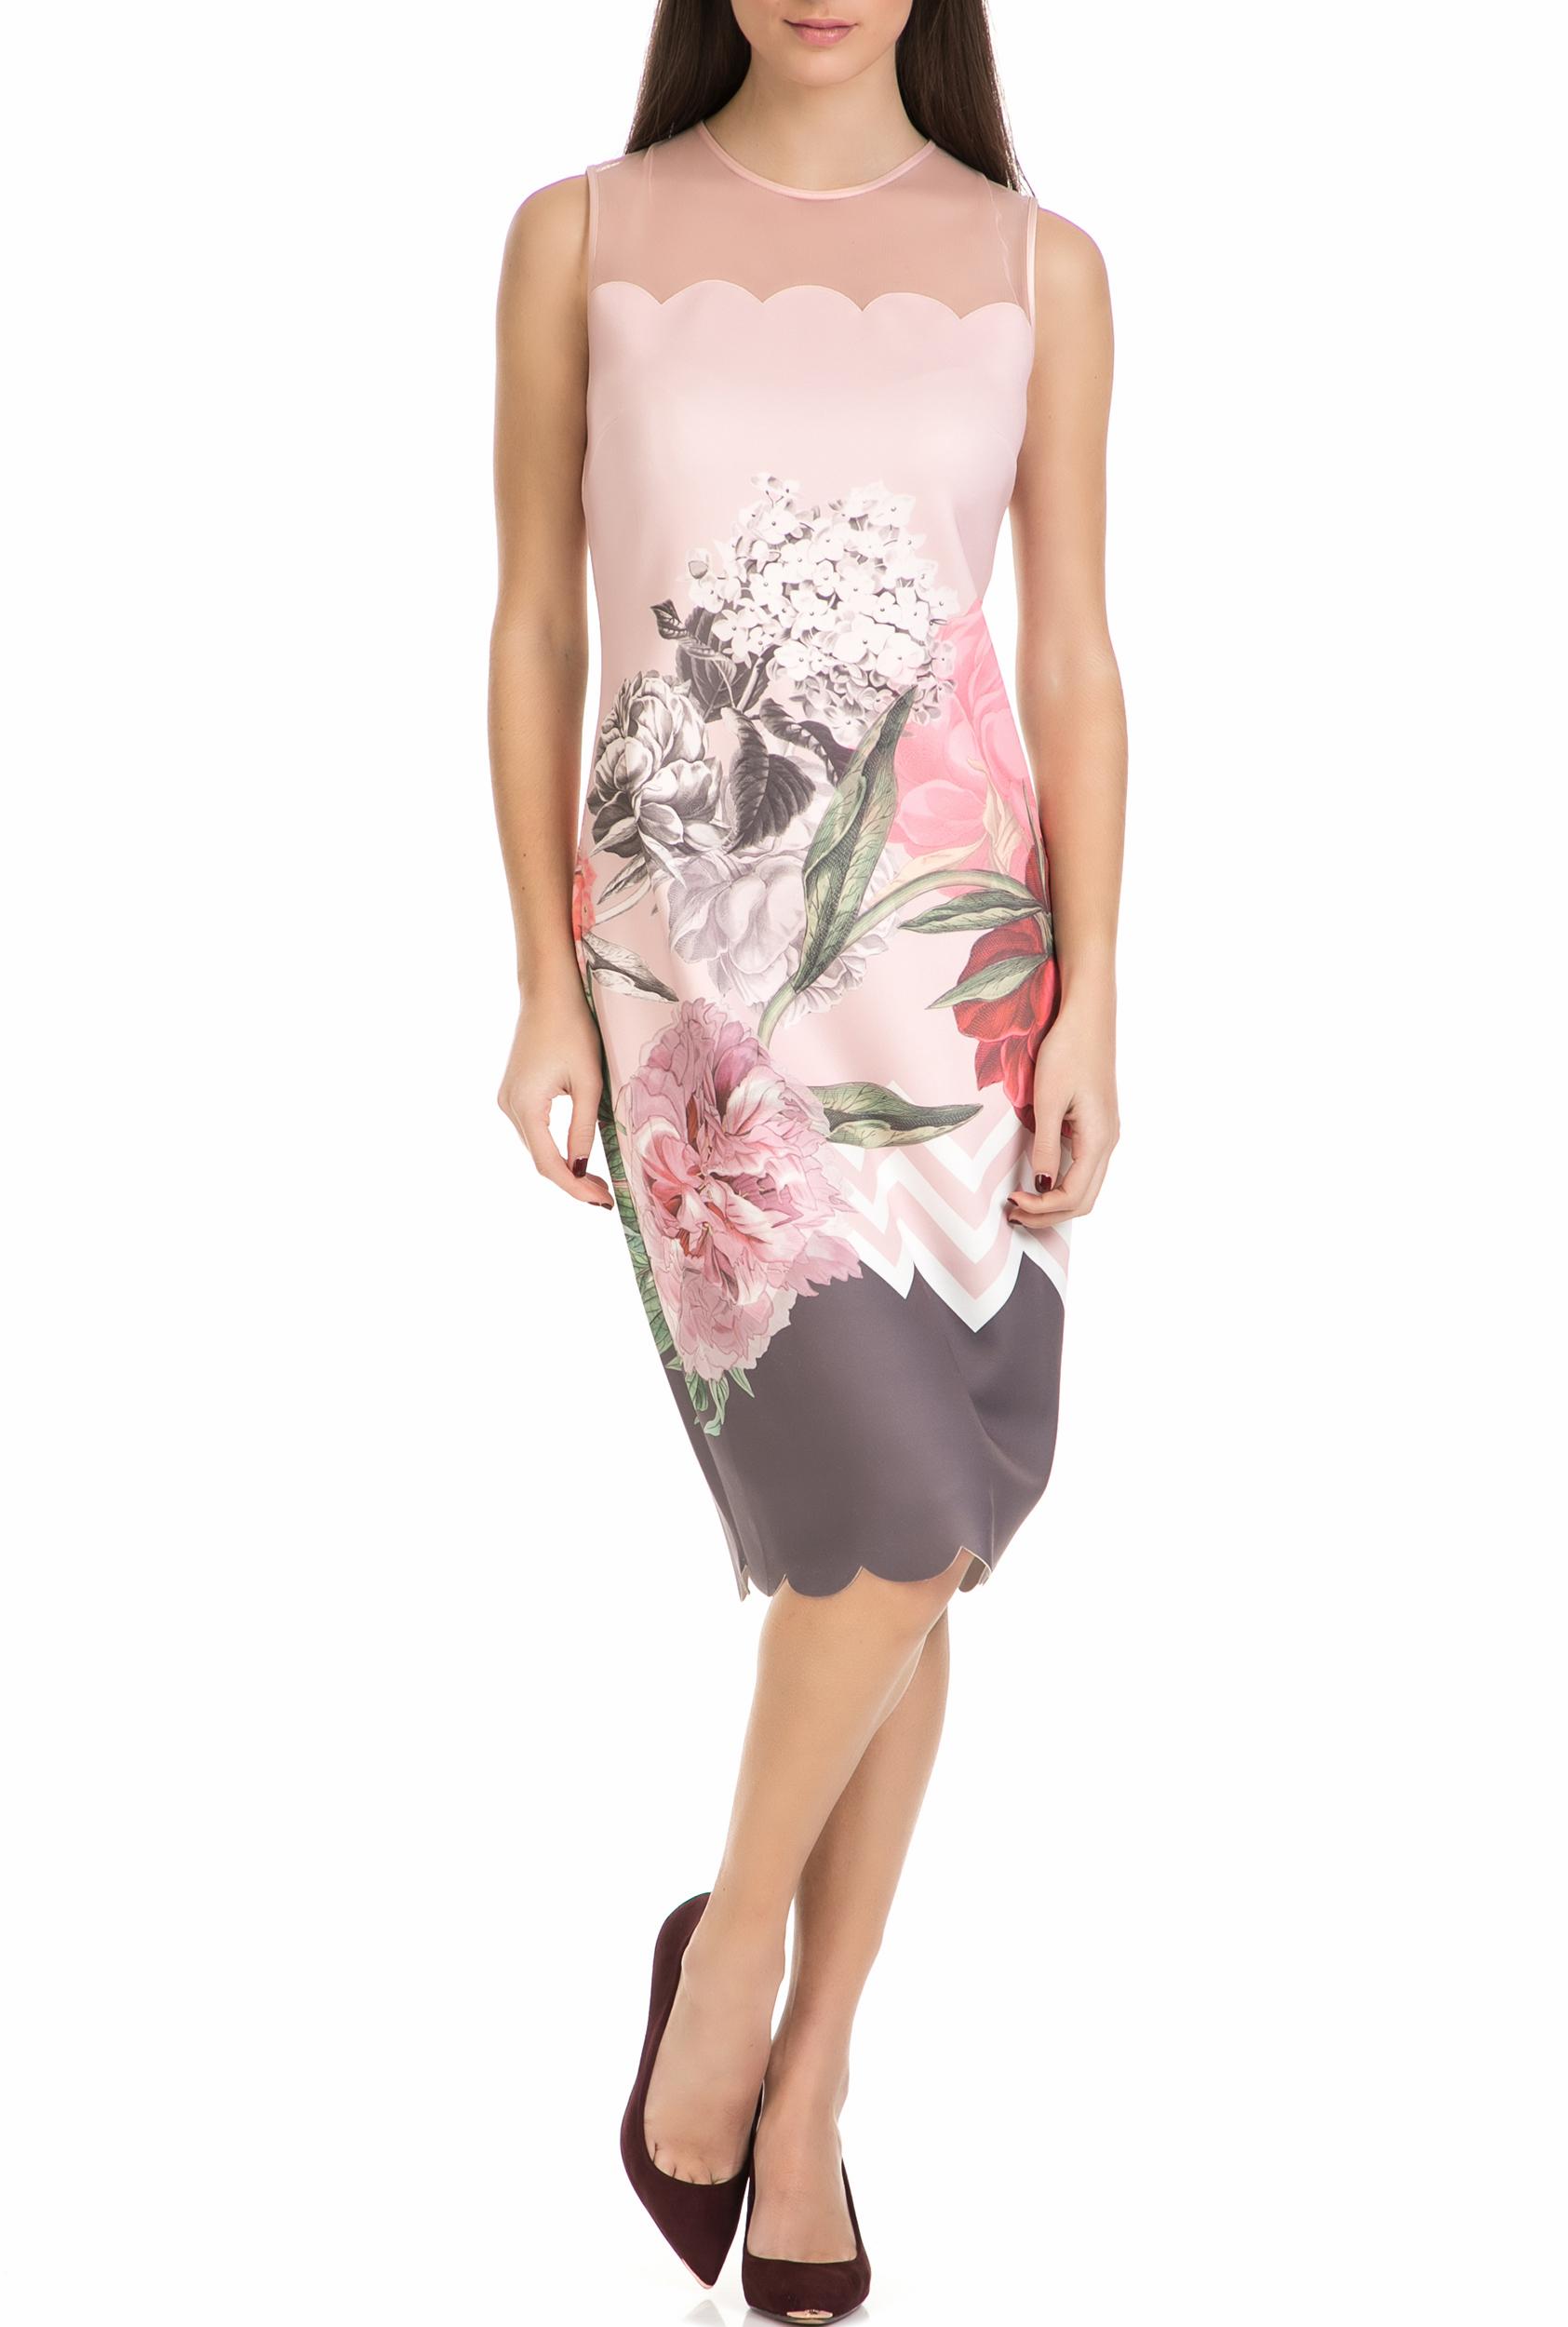 TED BAKER - Γυναικείο μίντι φόρεμα ARIONAH PALACE GARDENS SCALLOP ροζ με φλοράλ  γυναικεία ρούχα φορέματα μέχρι το γόνατο